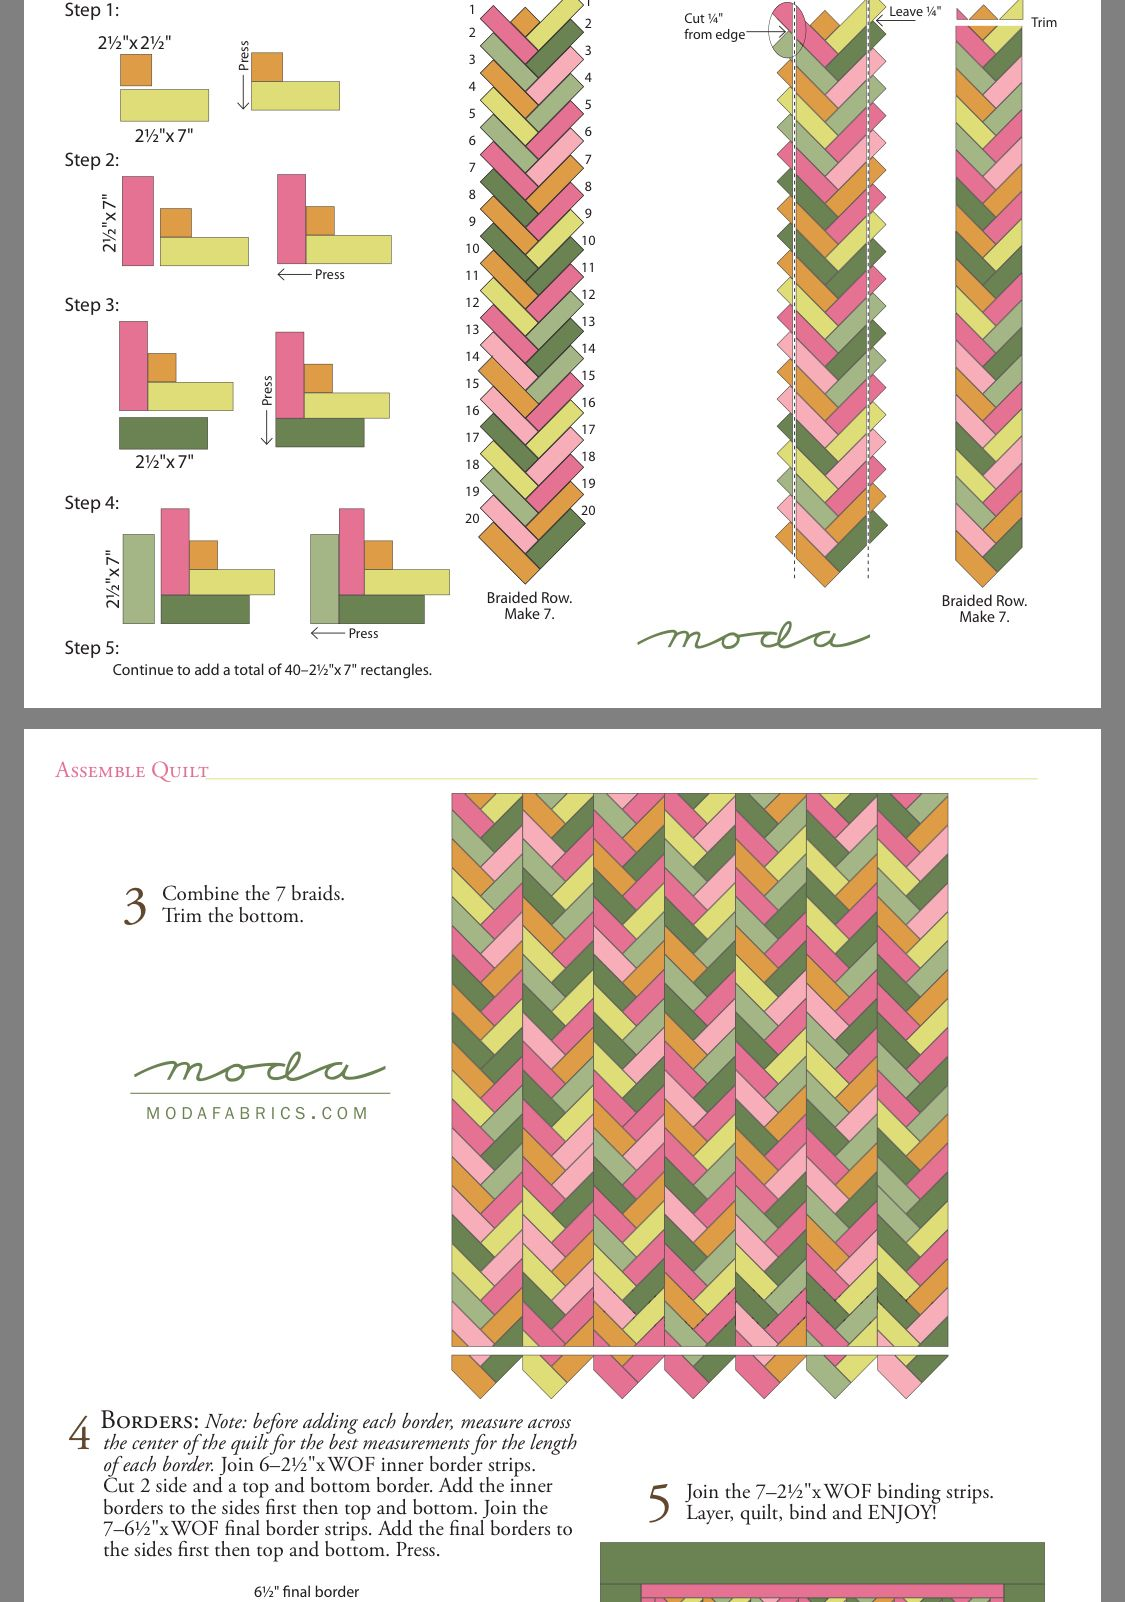 Floral Wreath Quilt Quilting Pattern From Mh Designs New Salvabrani Favland Org Quilt Border Braid Quilt Quilt Patterns